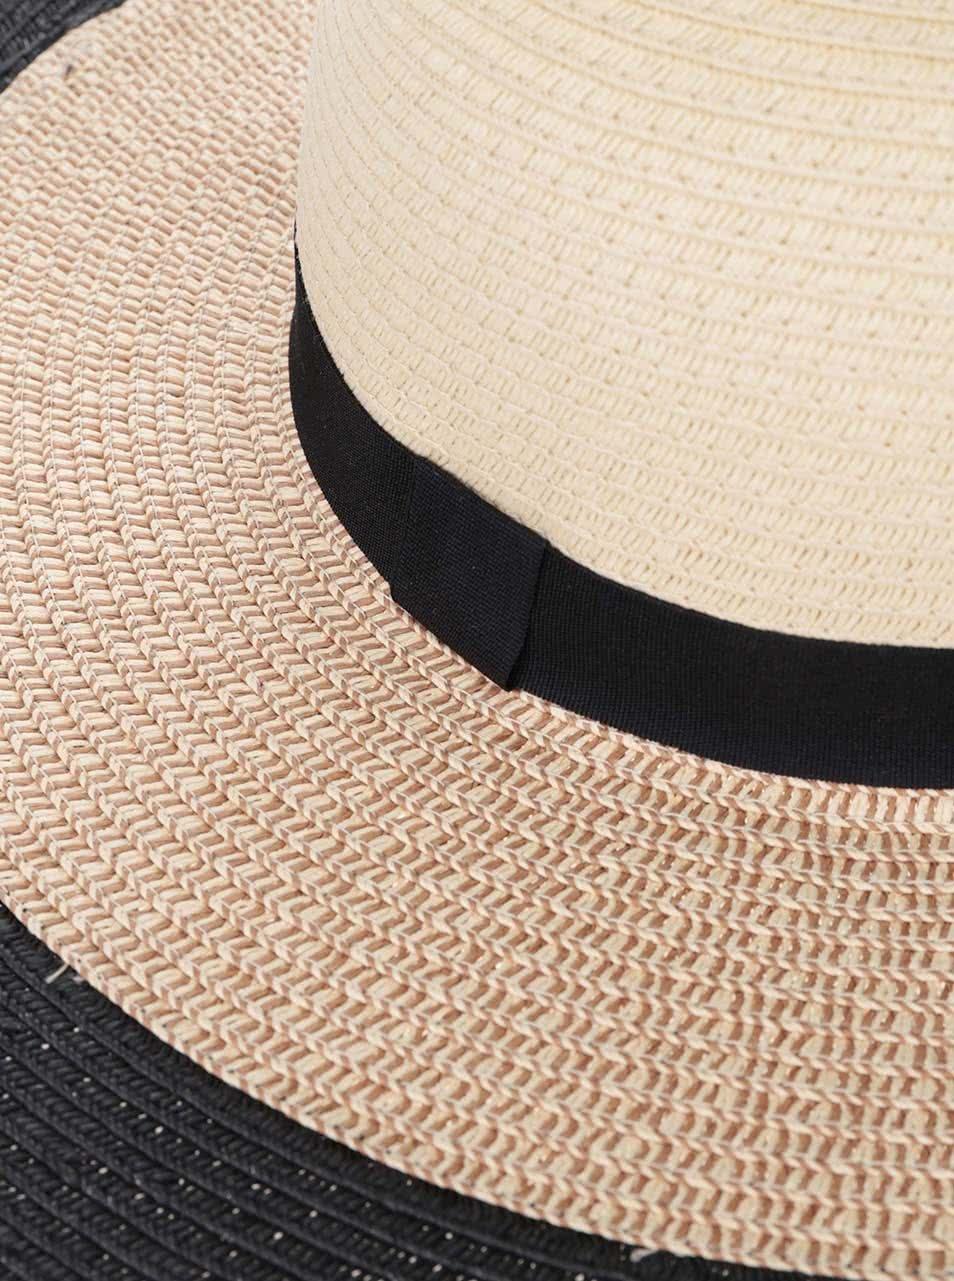 fd4af9d2c27 Slaměný klobouk s černým lemem VERO MODA Kattie ...